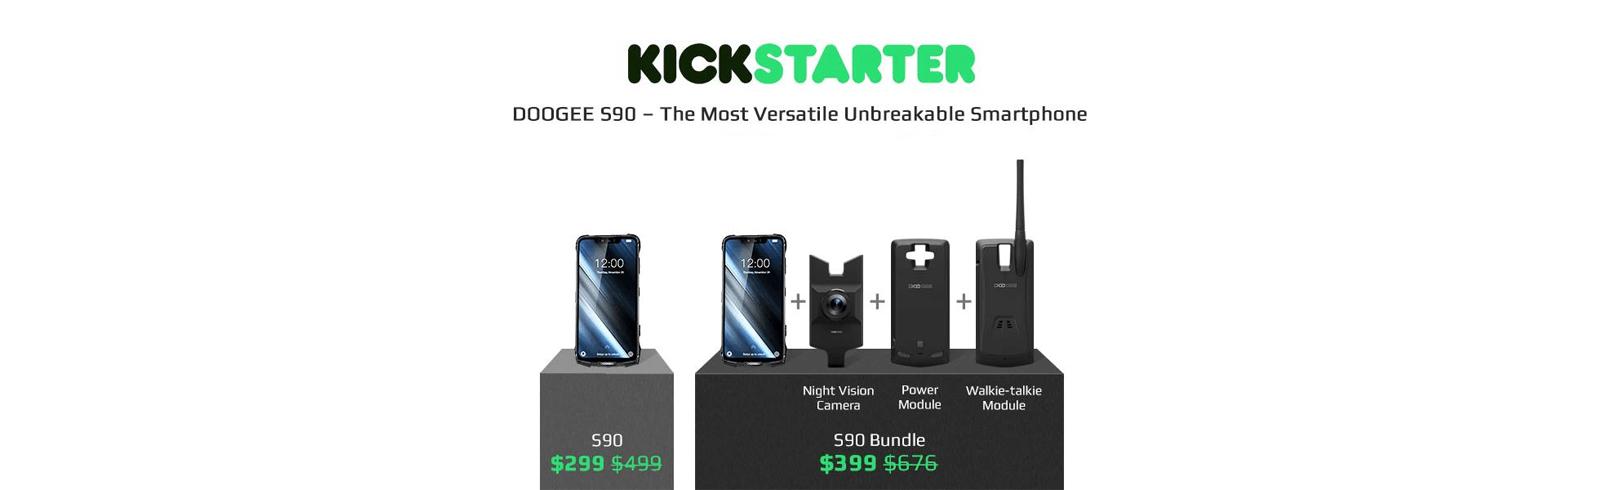 Doogee S90 with Digital Walkie Talkie - a versatile communication tool